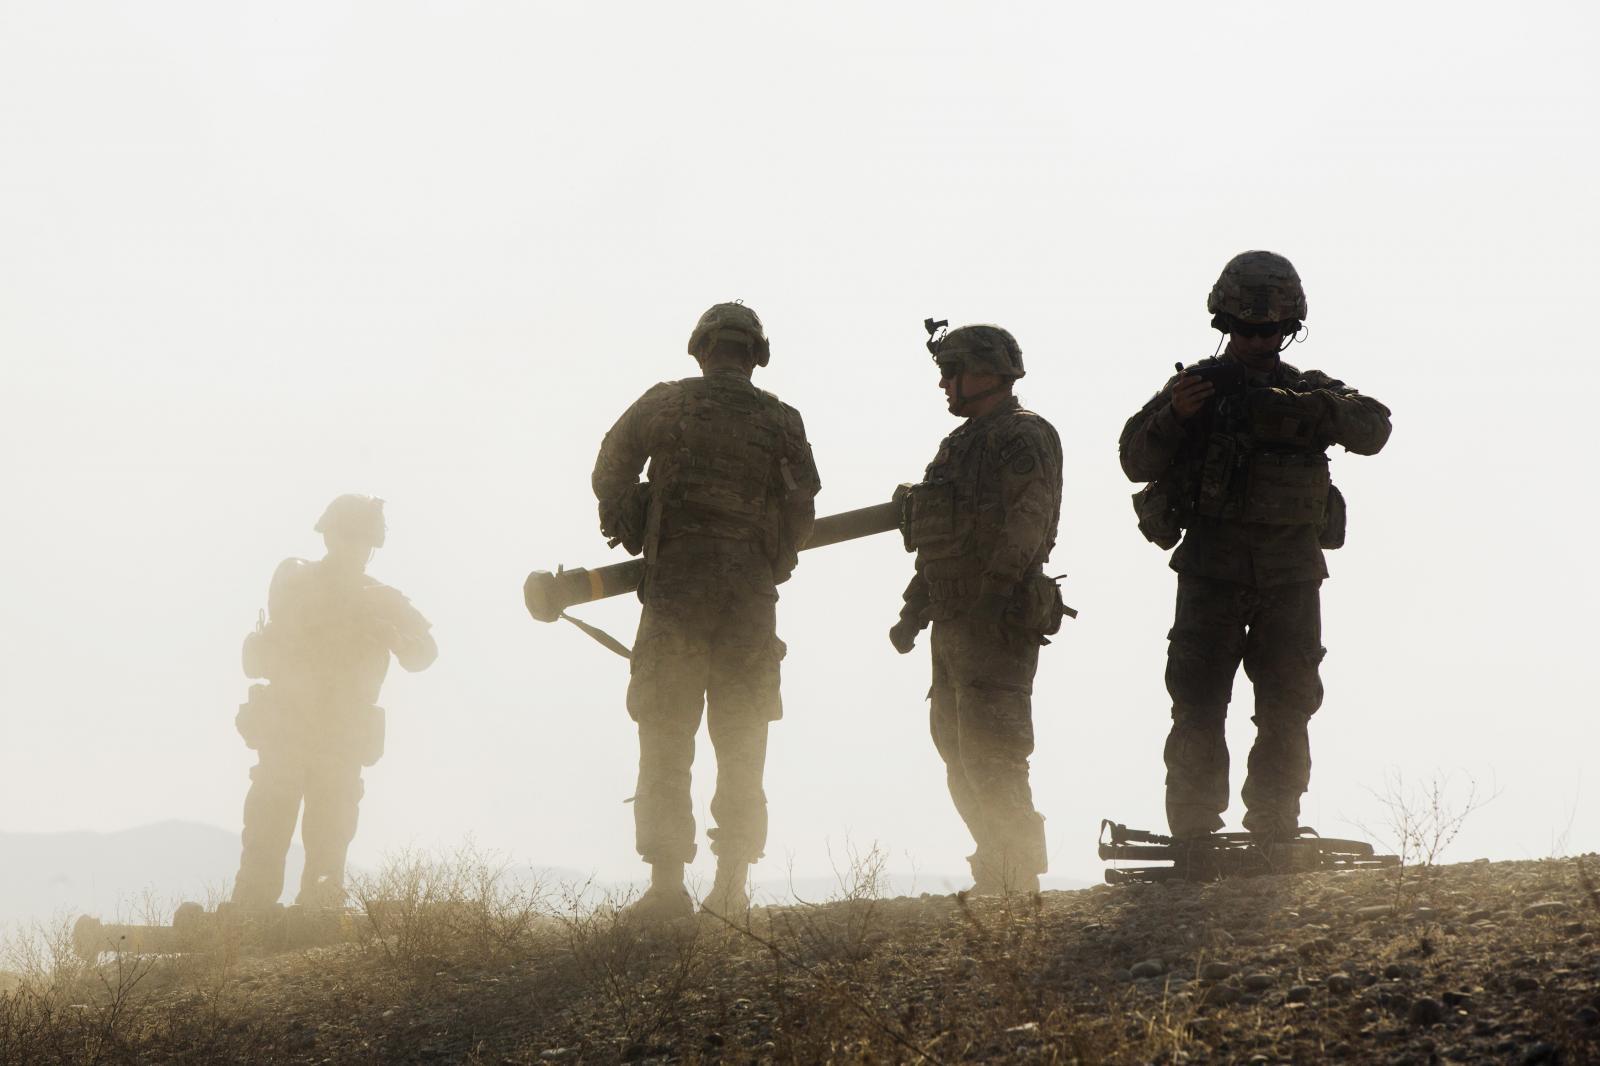 U.S. soldiers in Laghman Province, Afghanistan, December 2014